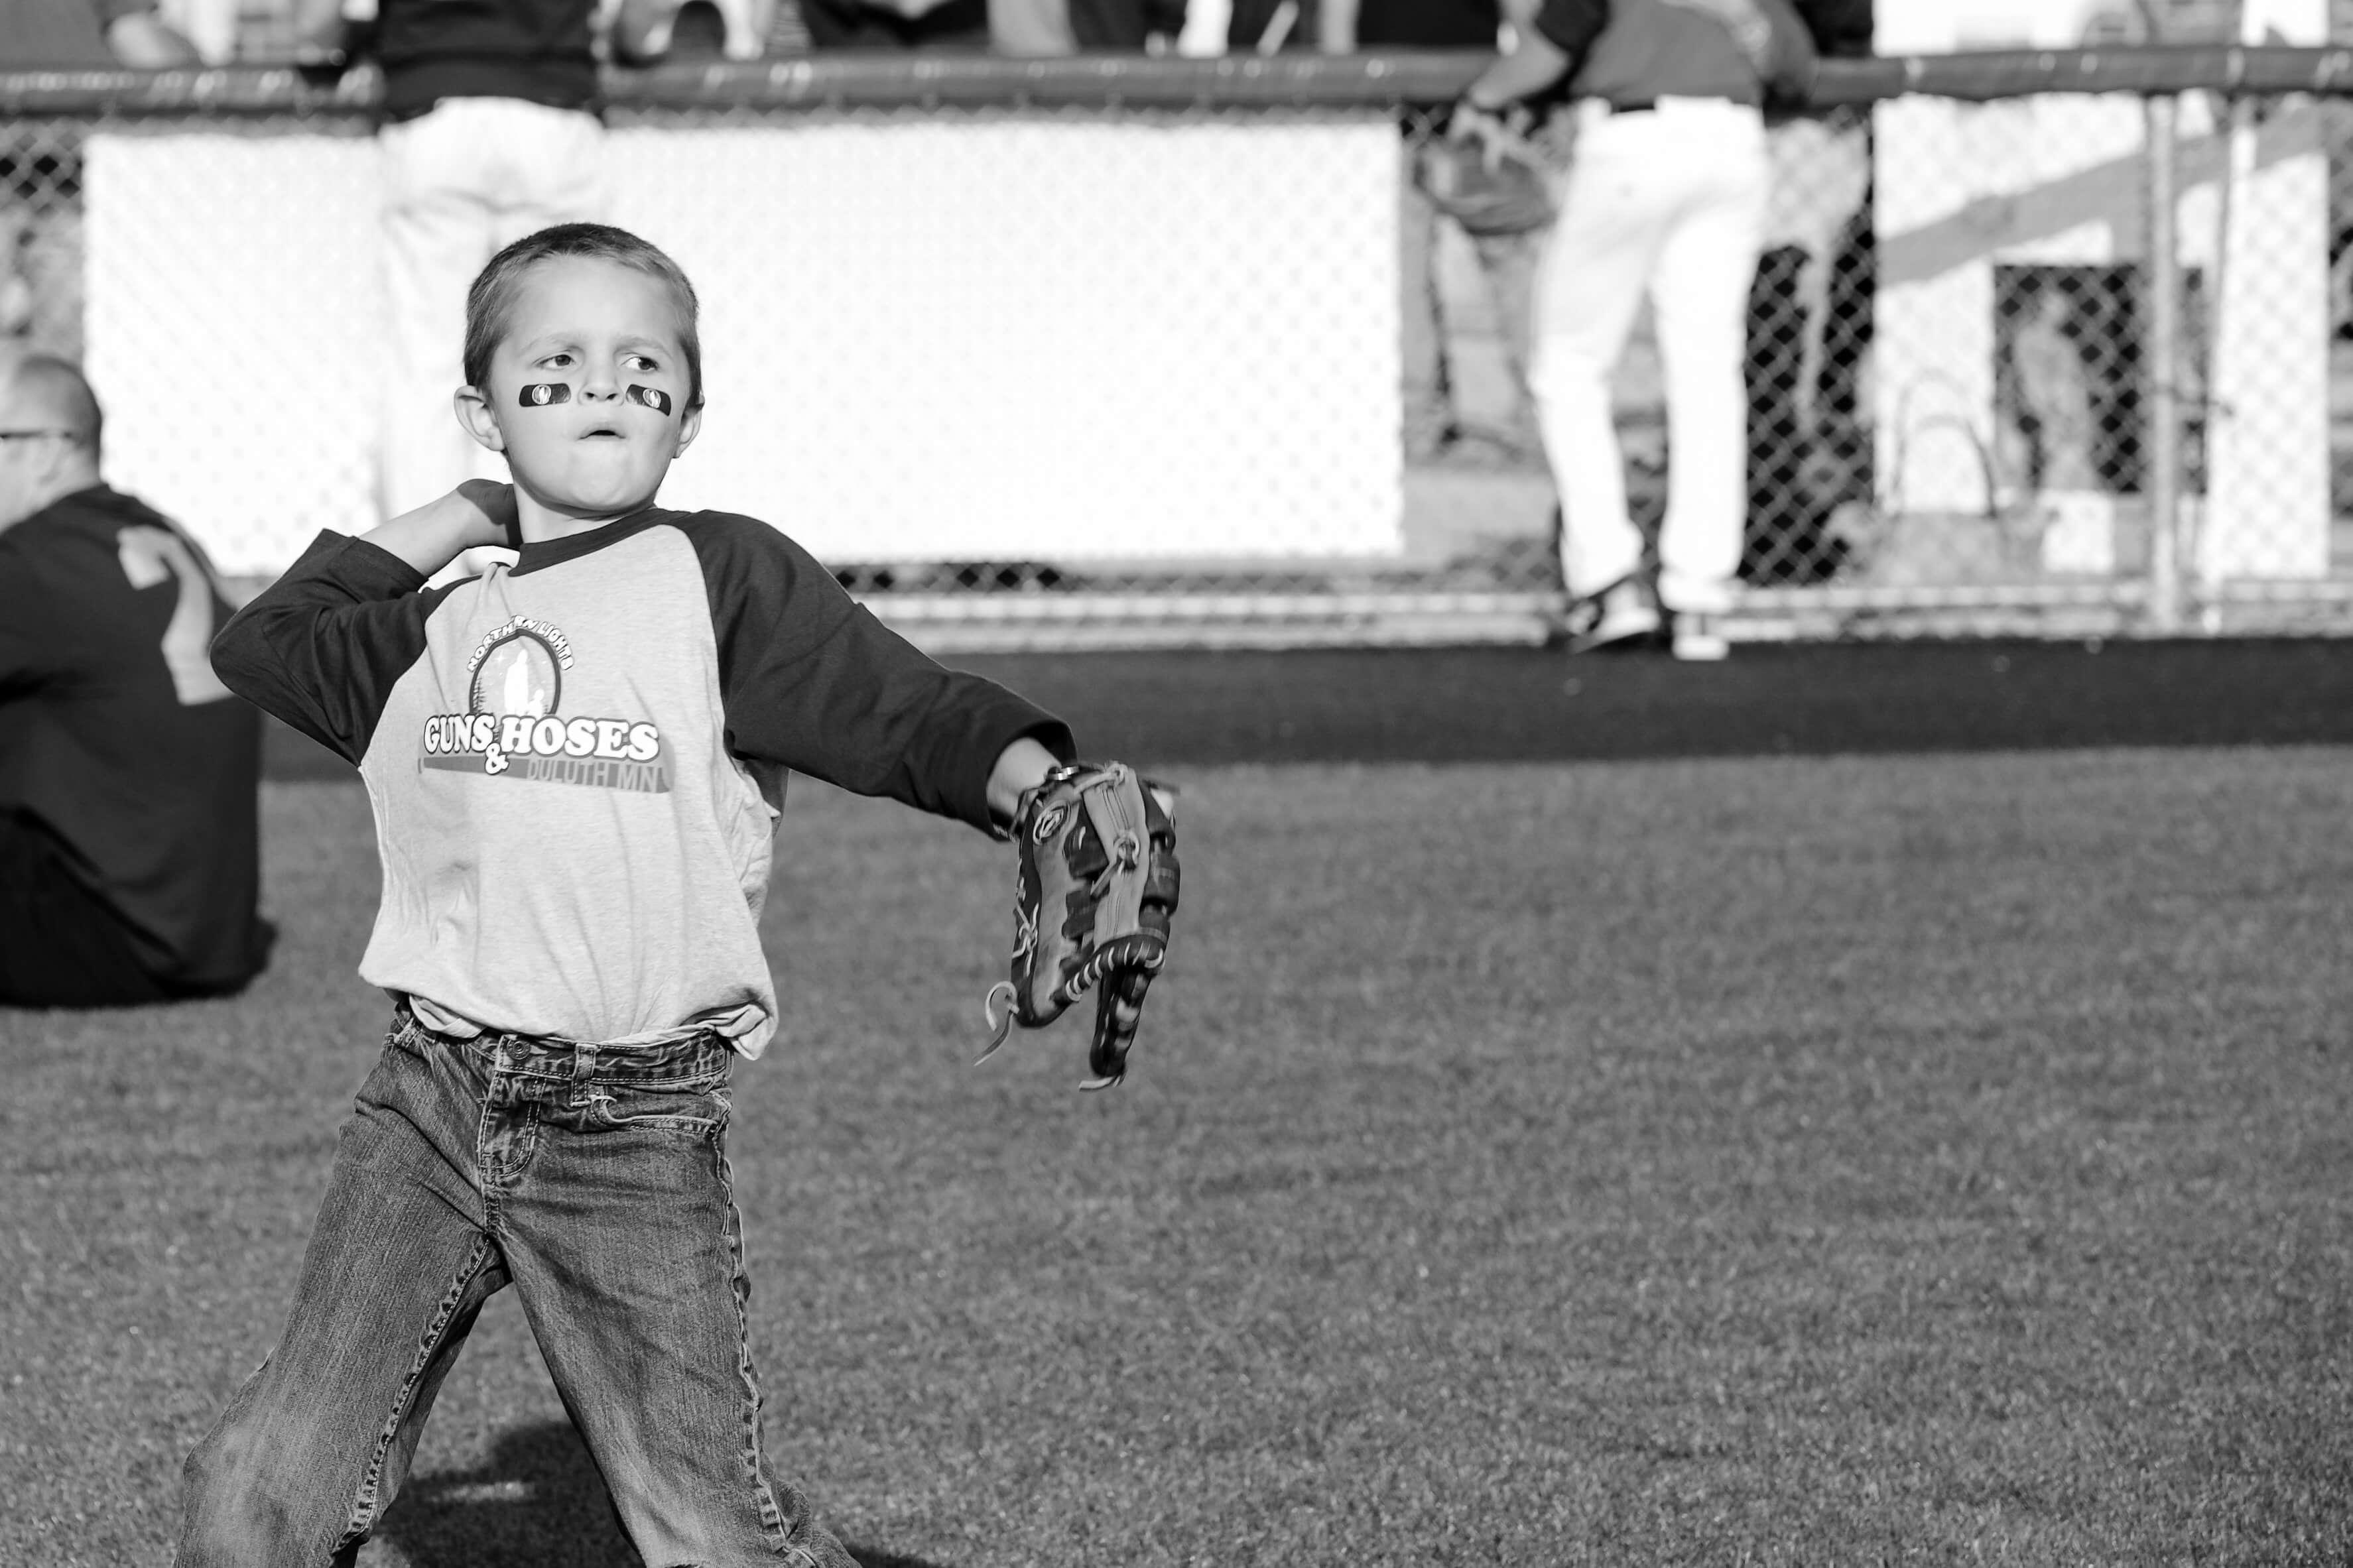 Northern Lights Foundation - Guns & Hoses kid throwing baseball